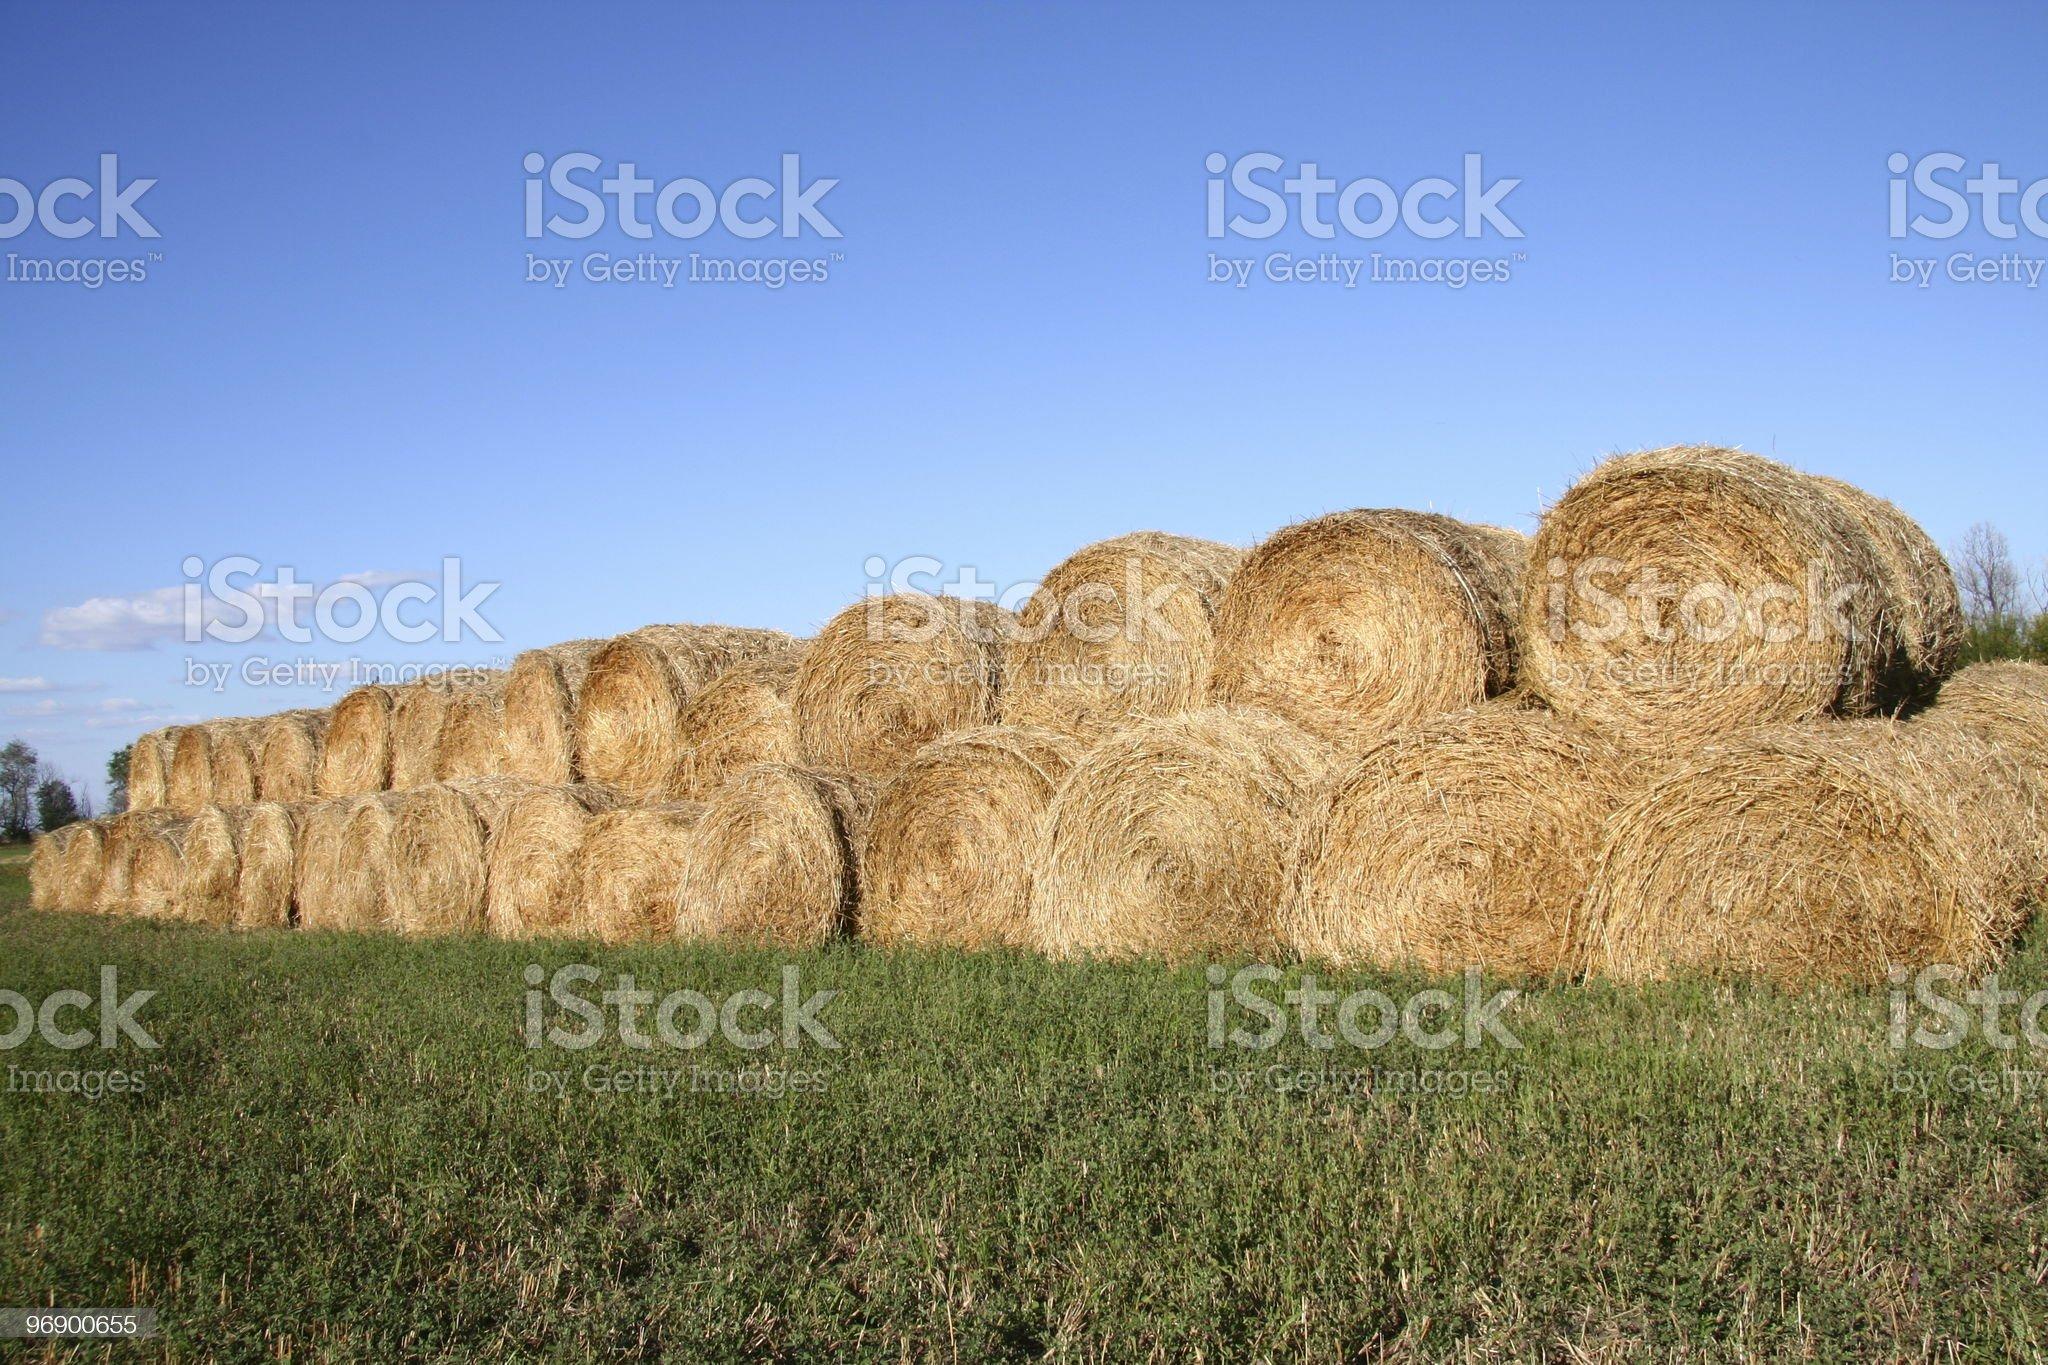 Neatly Piled Bale Pile royalty-free stock photo